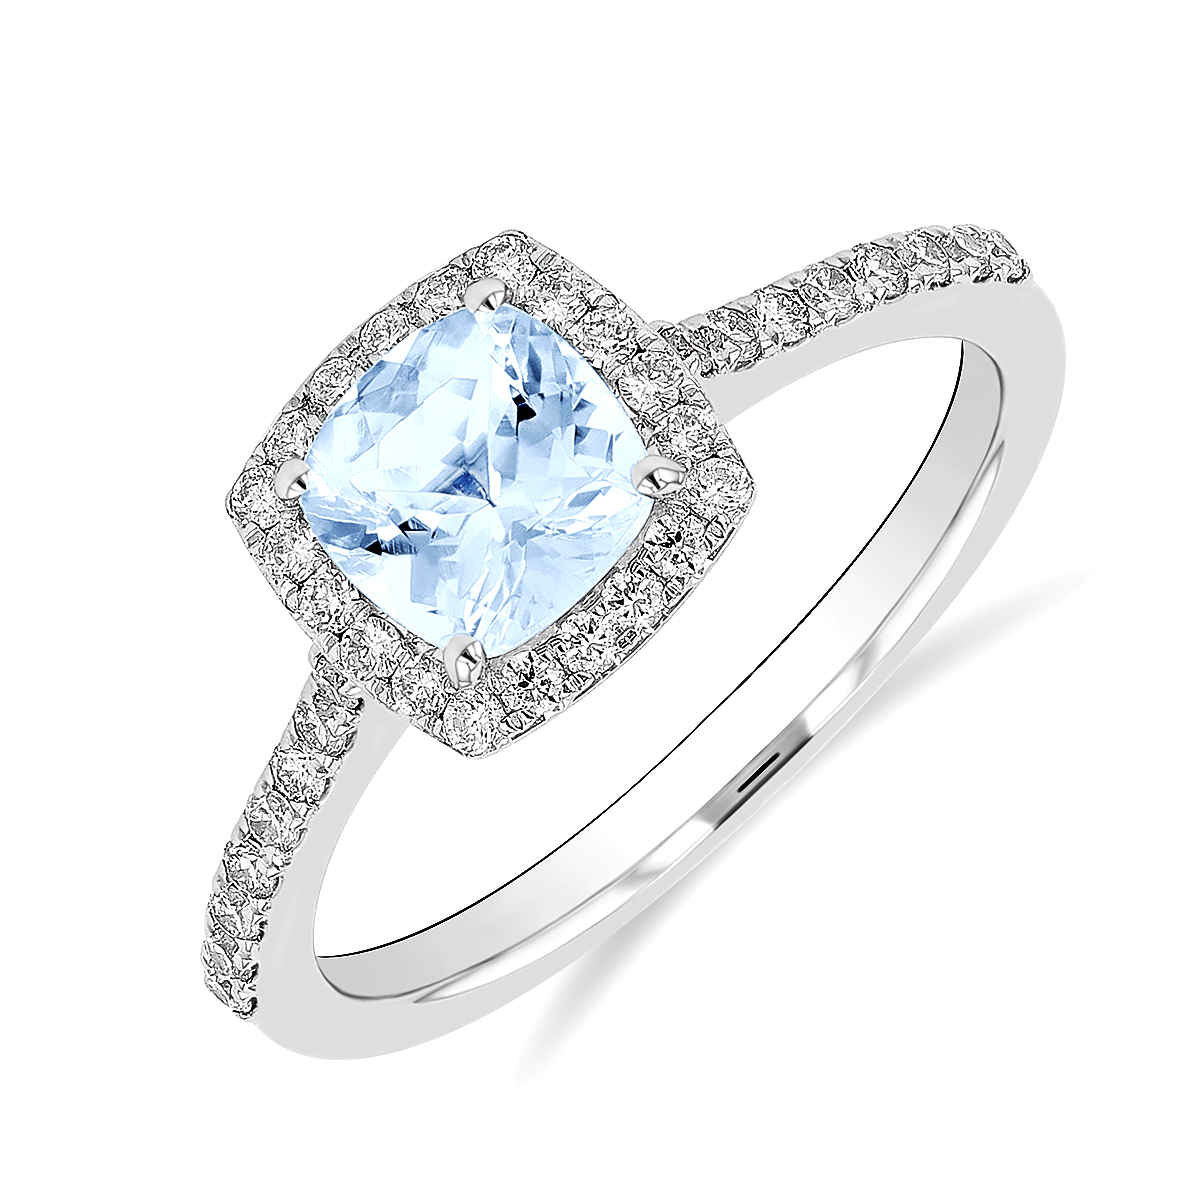 Rosa Mer Collection 0.92ct Cushion Cut Aquamarine & Diamond Halo Ring